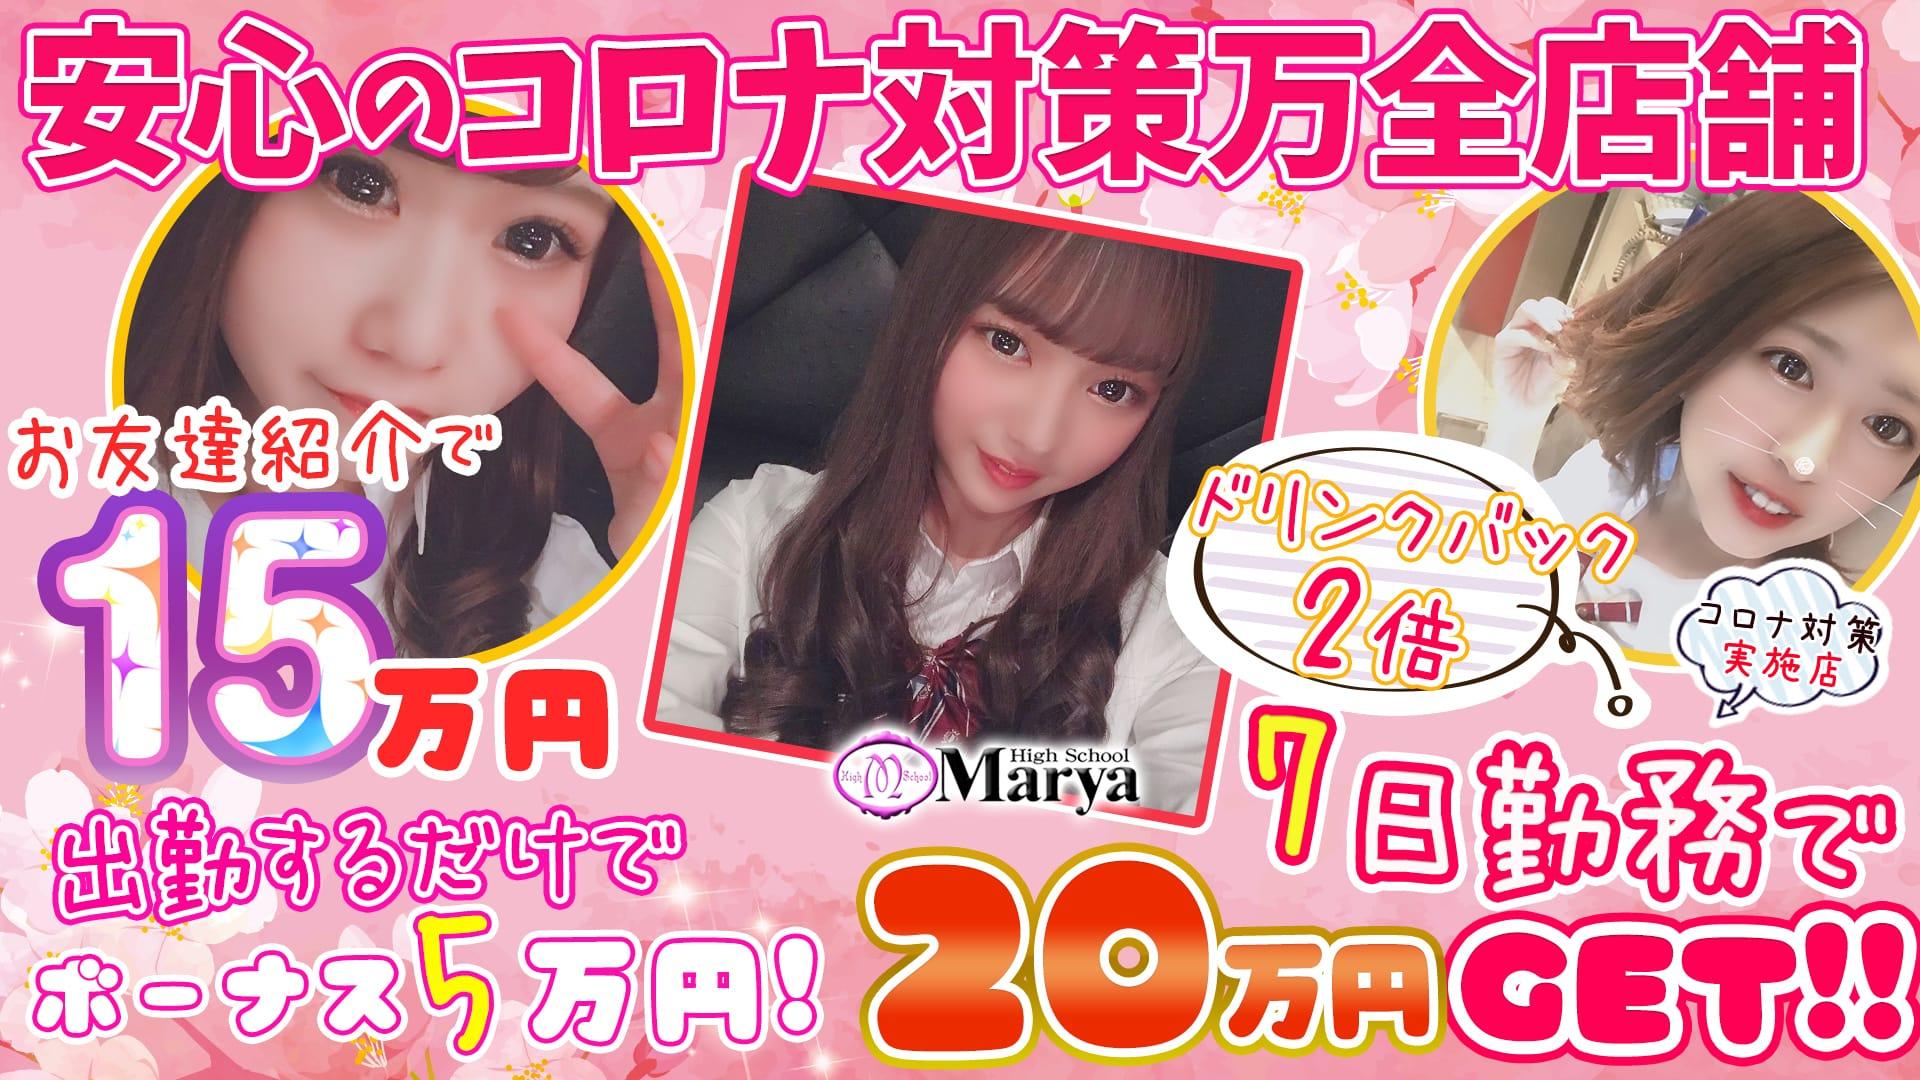 High School Marya ~ハイスクール マーヤ~池袋店 池袋キャバクラ TOP画像